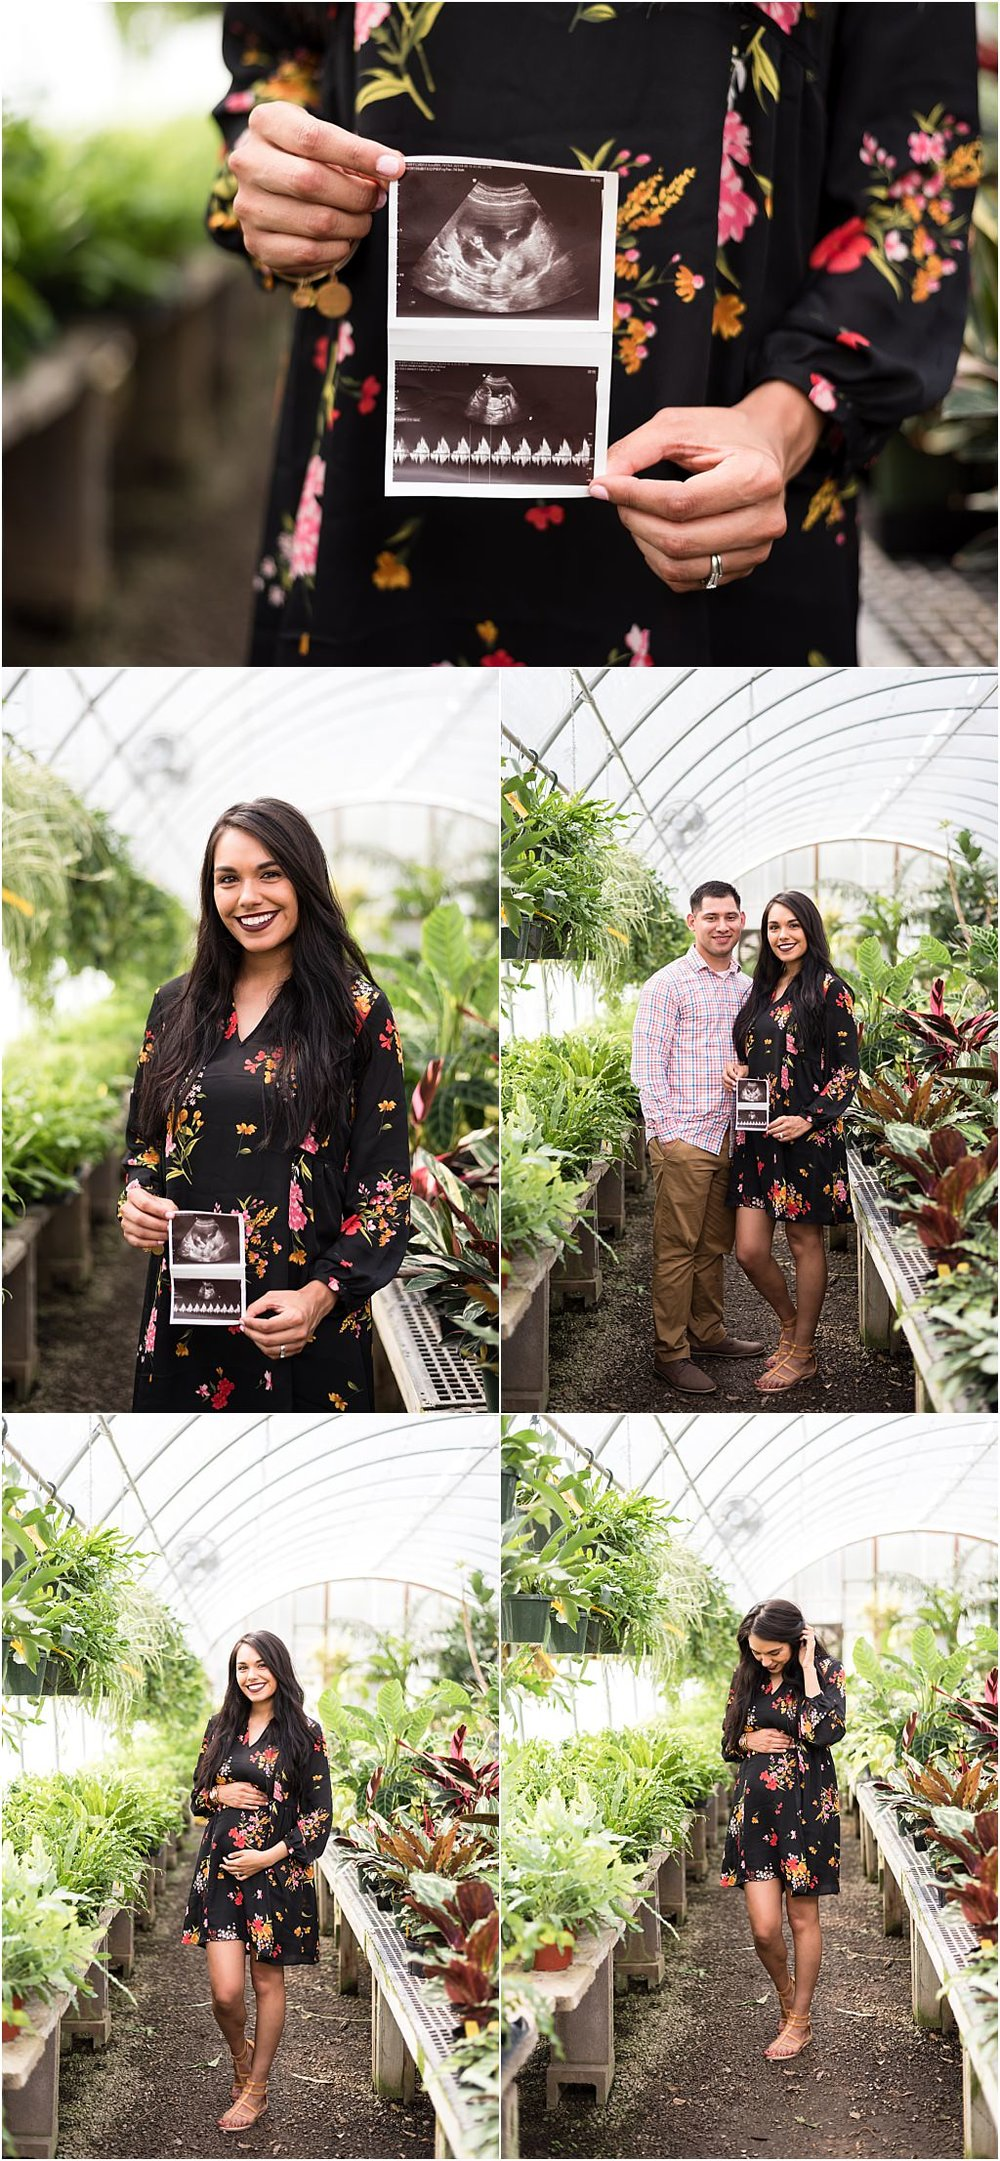 Hewitt-Garden-Center-Green-House-Phoography-Session-Pregnancy-Announcement-Nashville-Lifestyle-Photographer+3